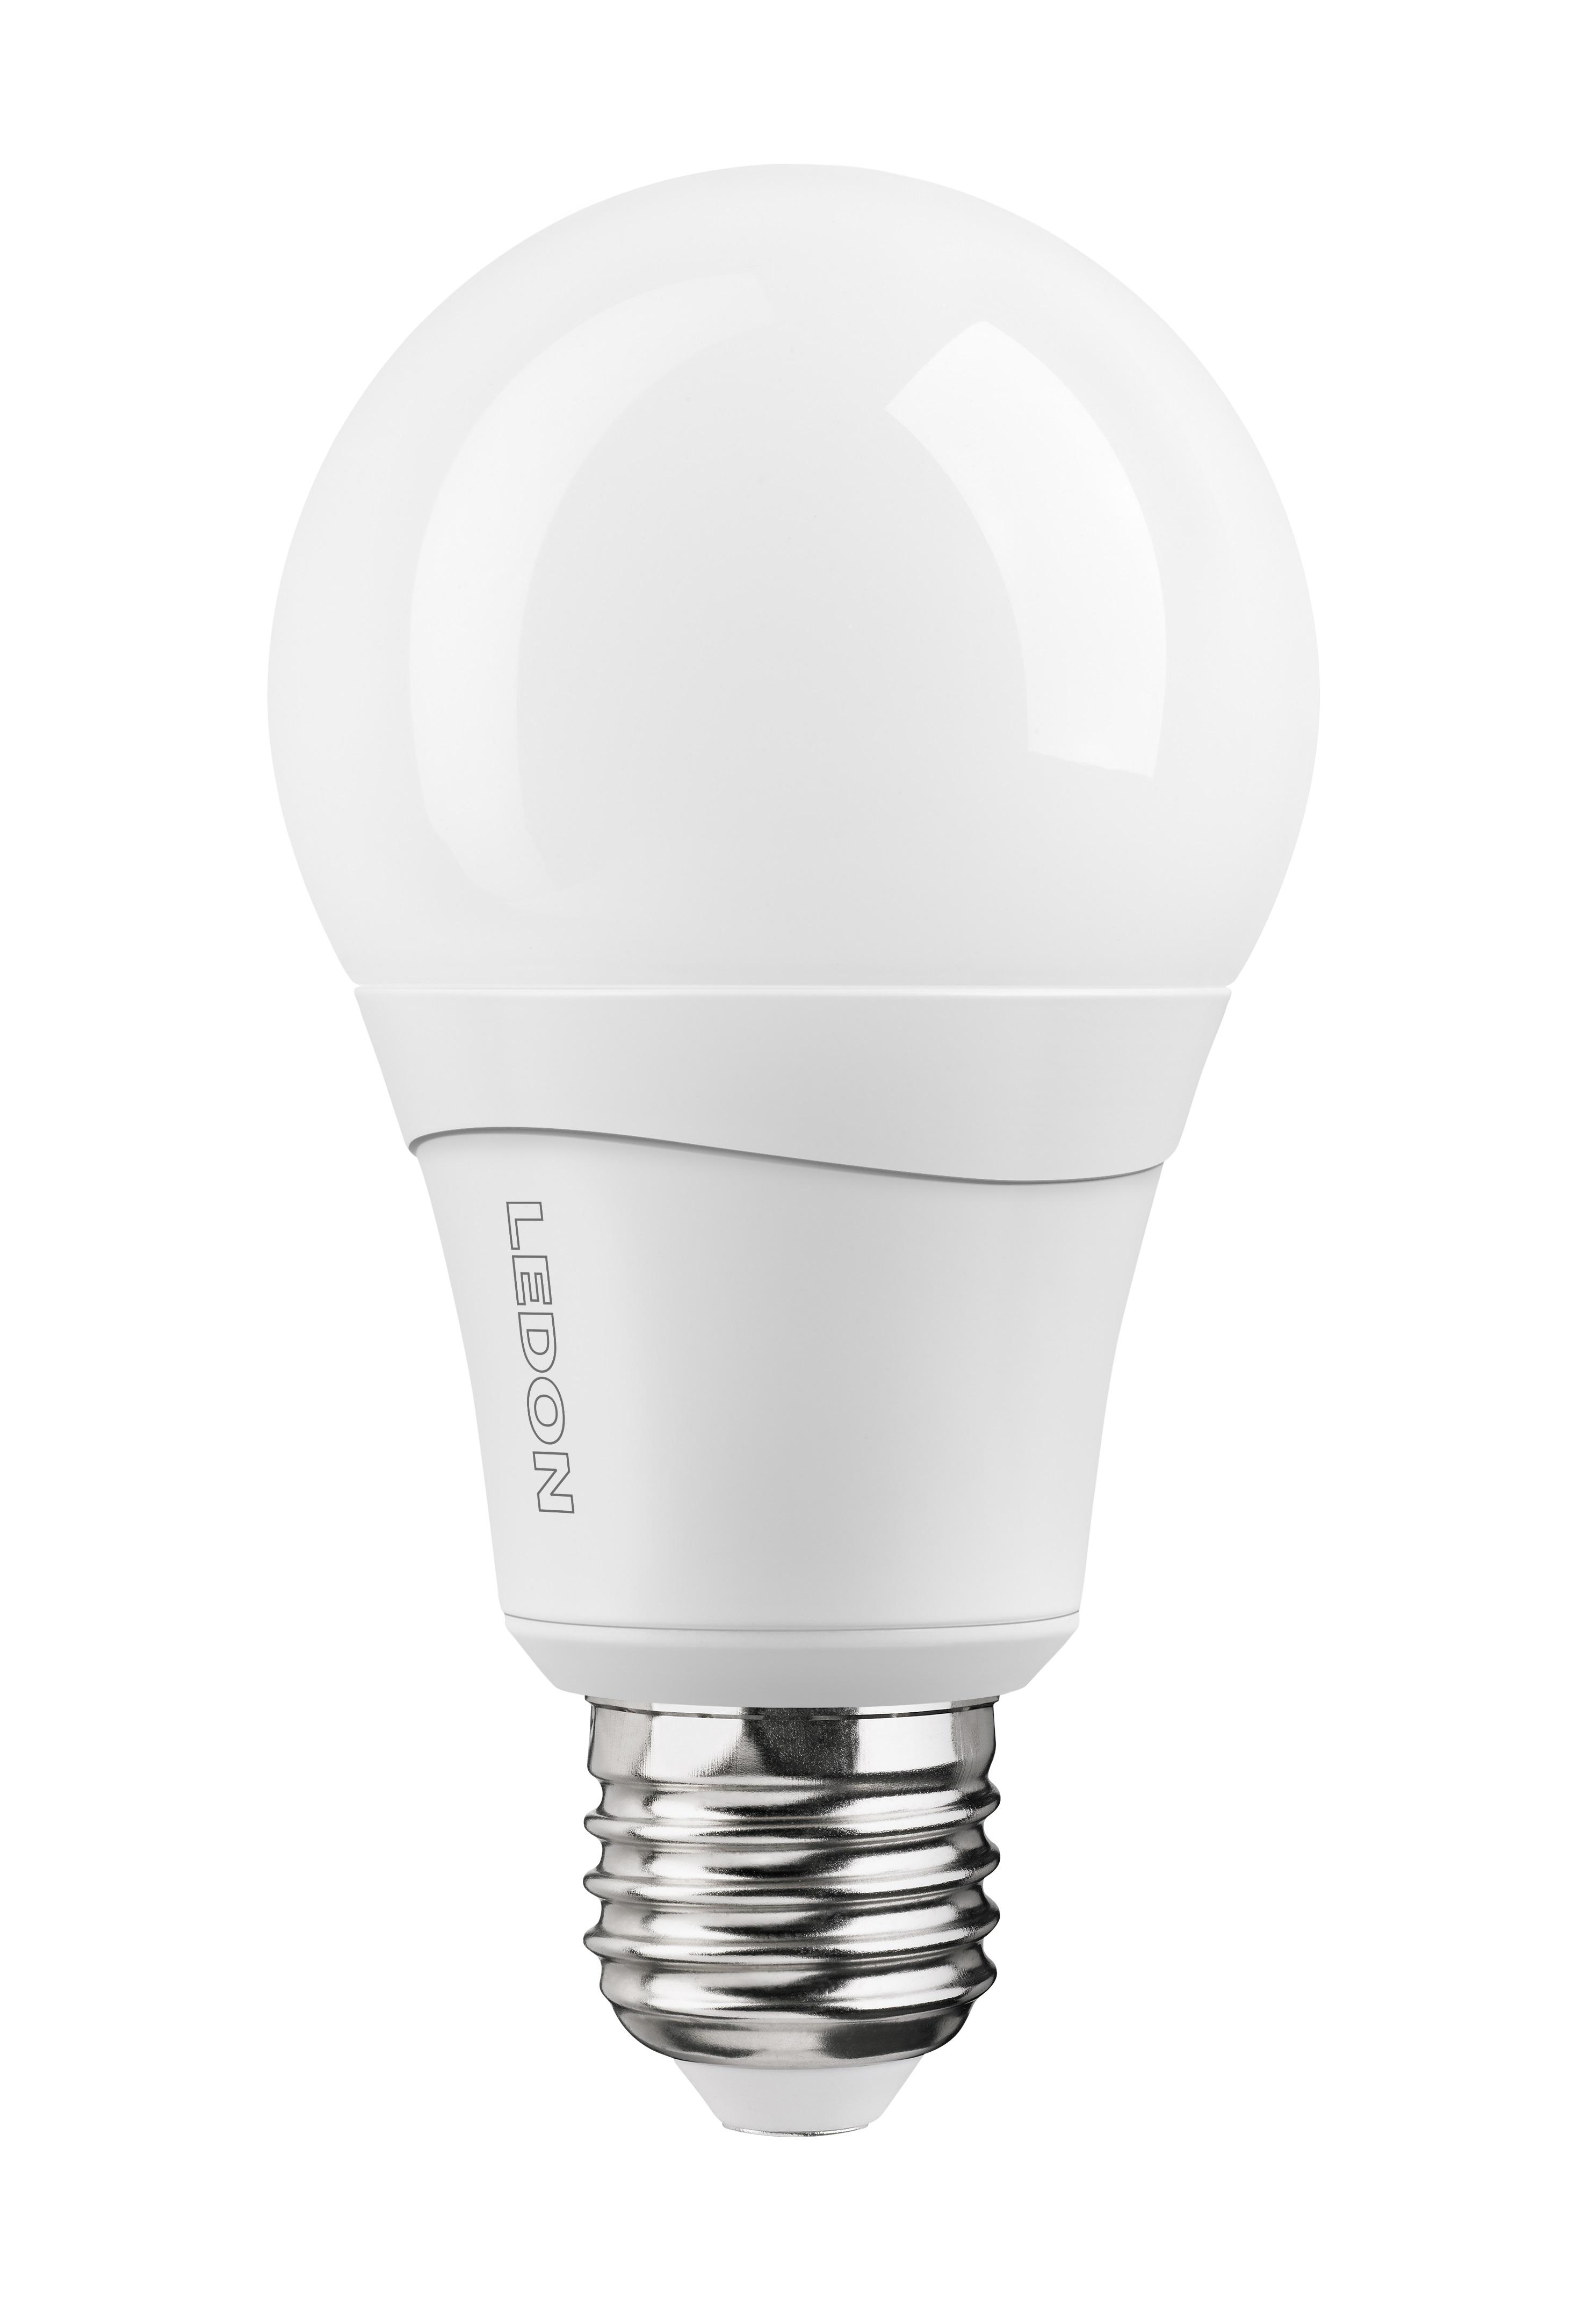 1 Stk LED Lampe A66 12.5W, 2700K, 1050lm, matt, E27, 230V LI29001030